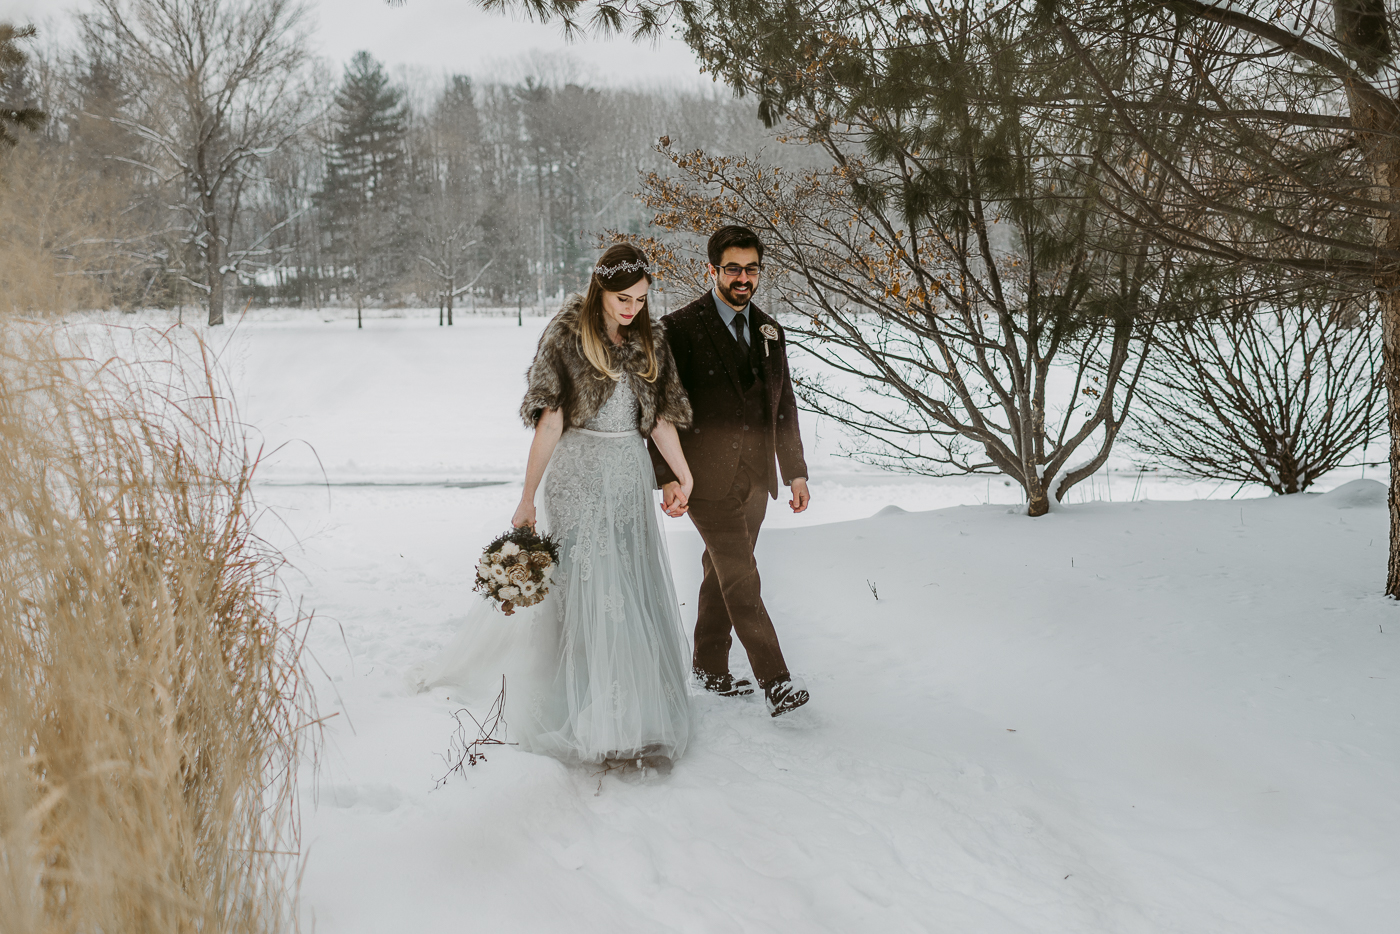 Squires-Castle-Winter-Wedding-13.jpg